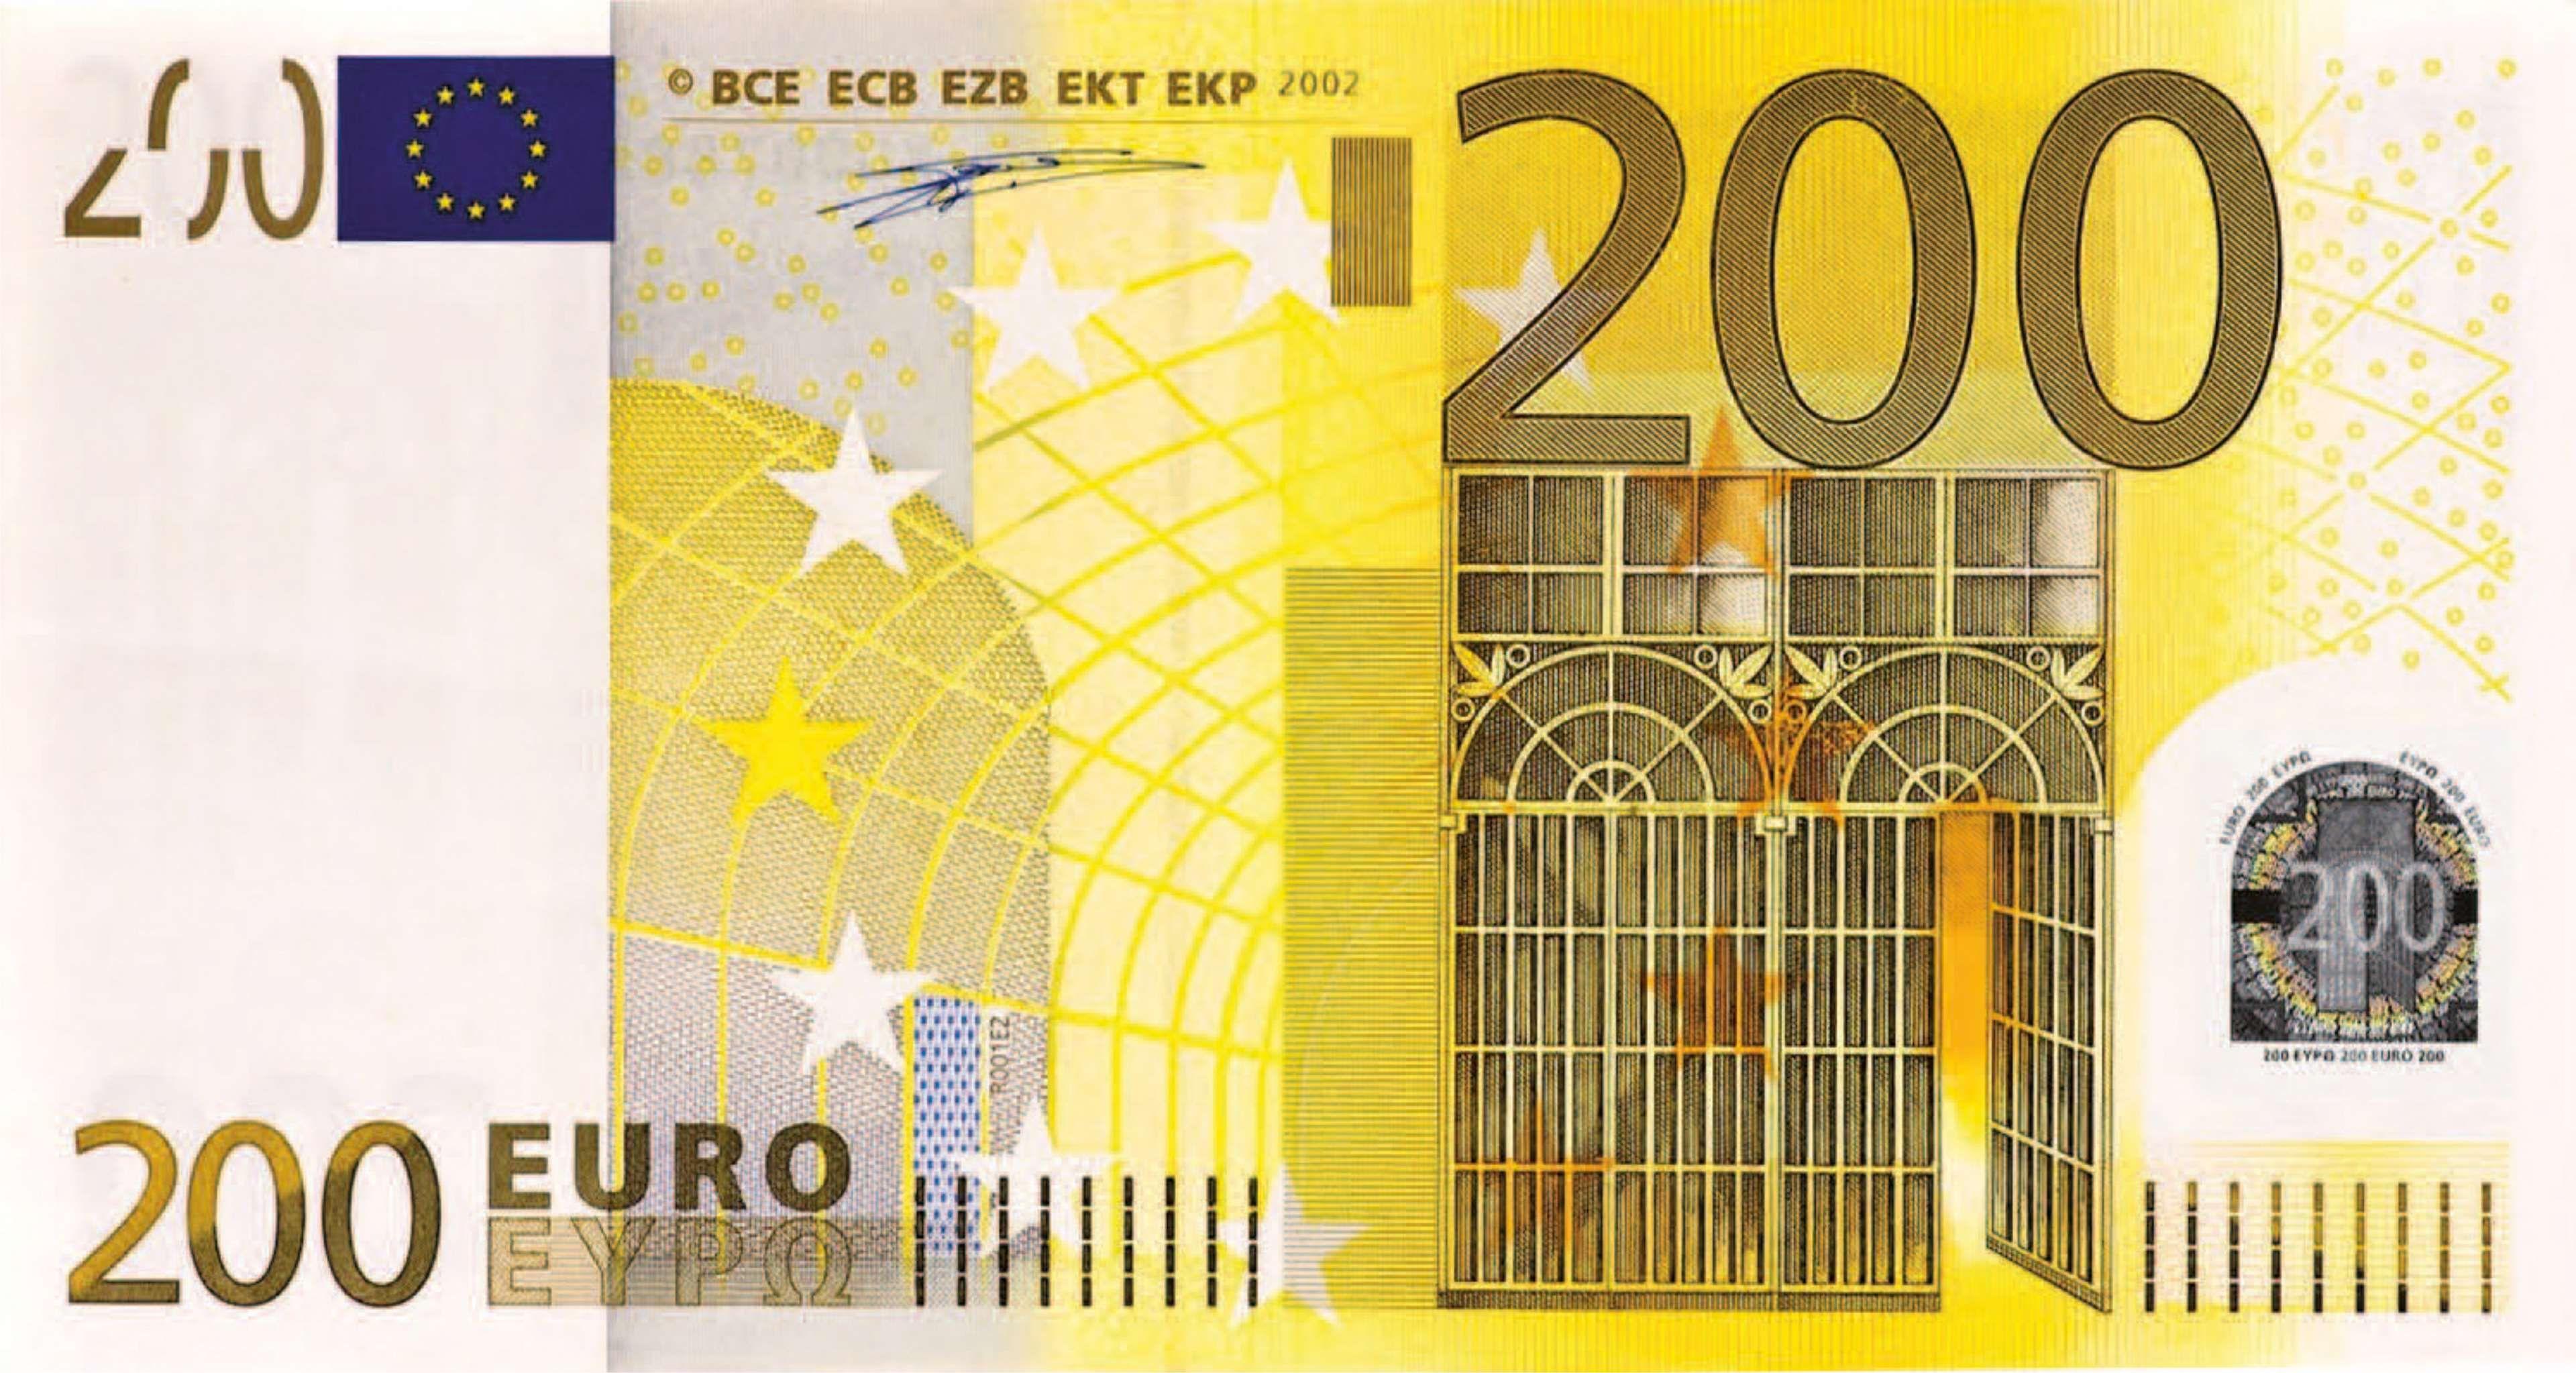 200 Euros Banknote Cash Currency Euro Money 4k Wallpaper Con